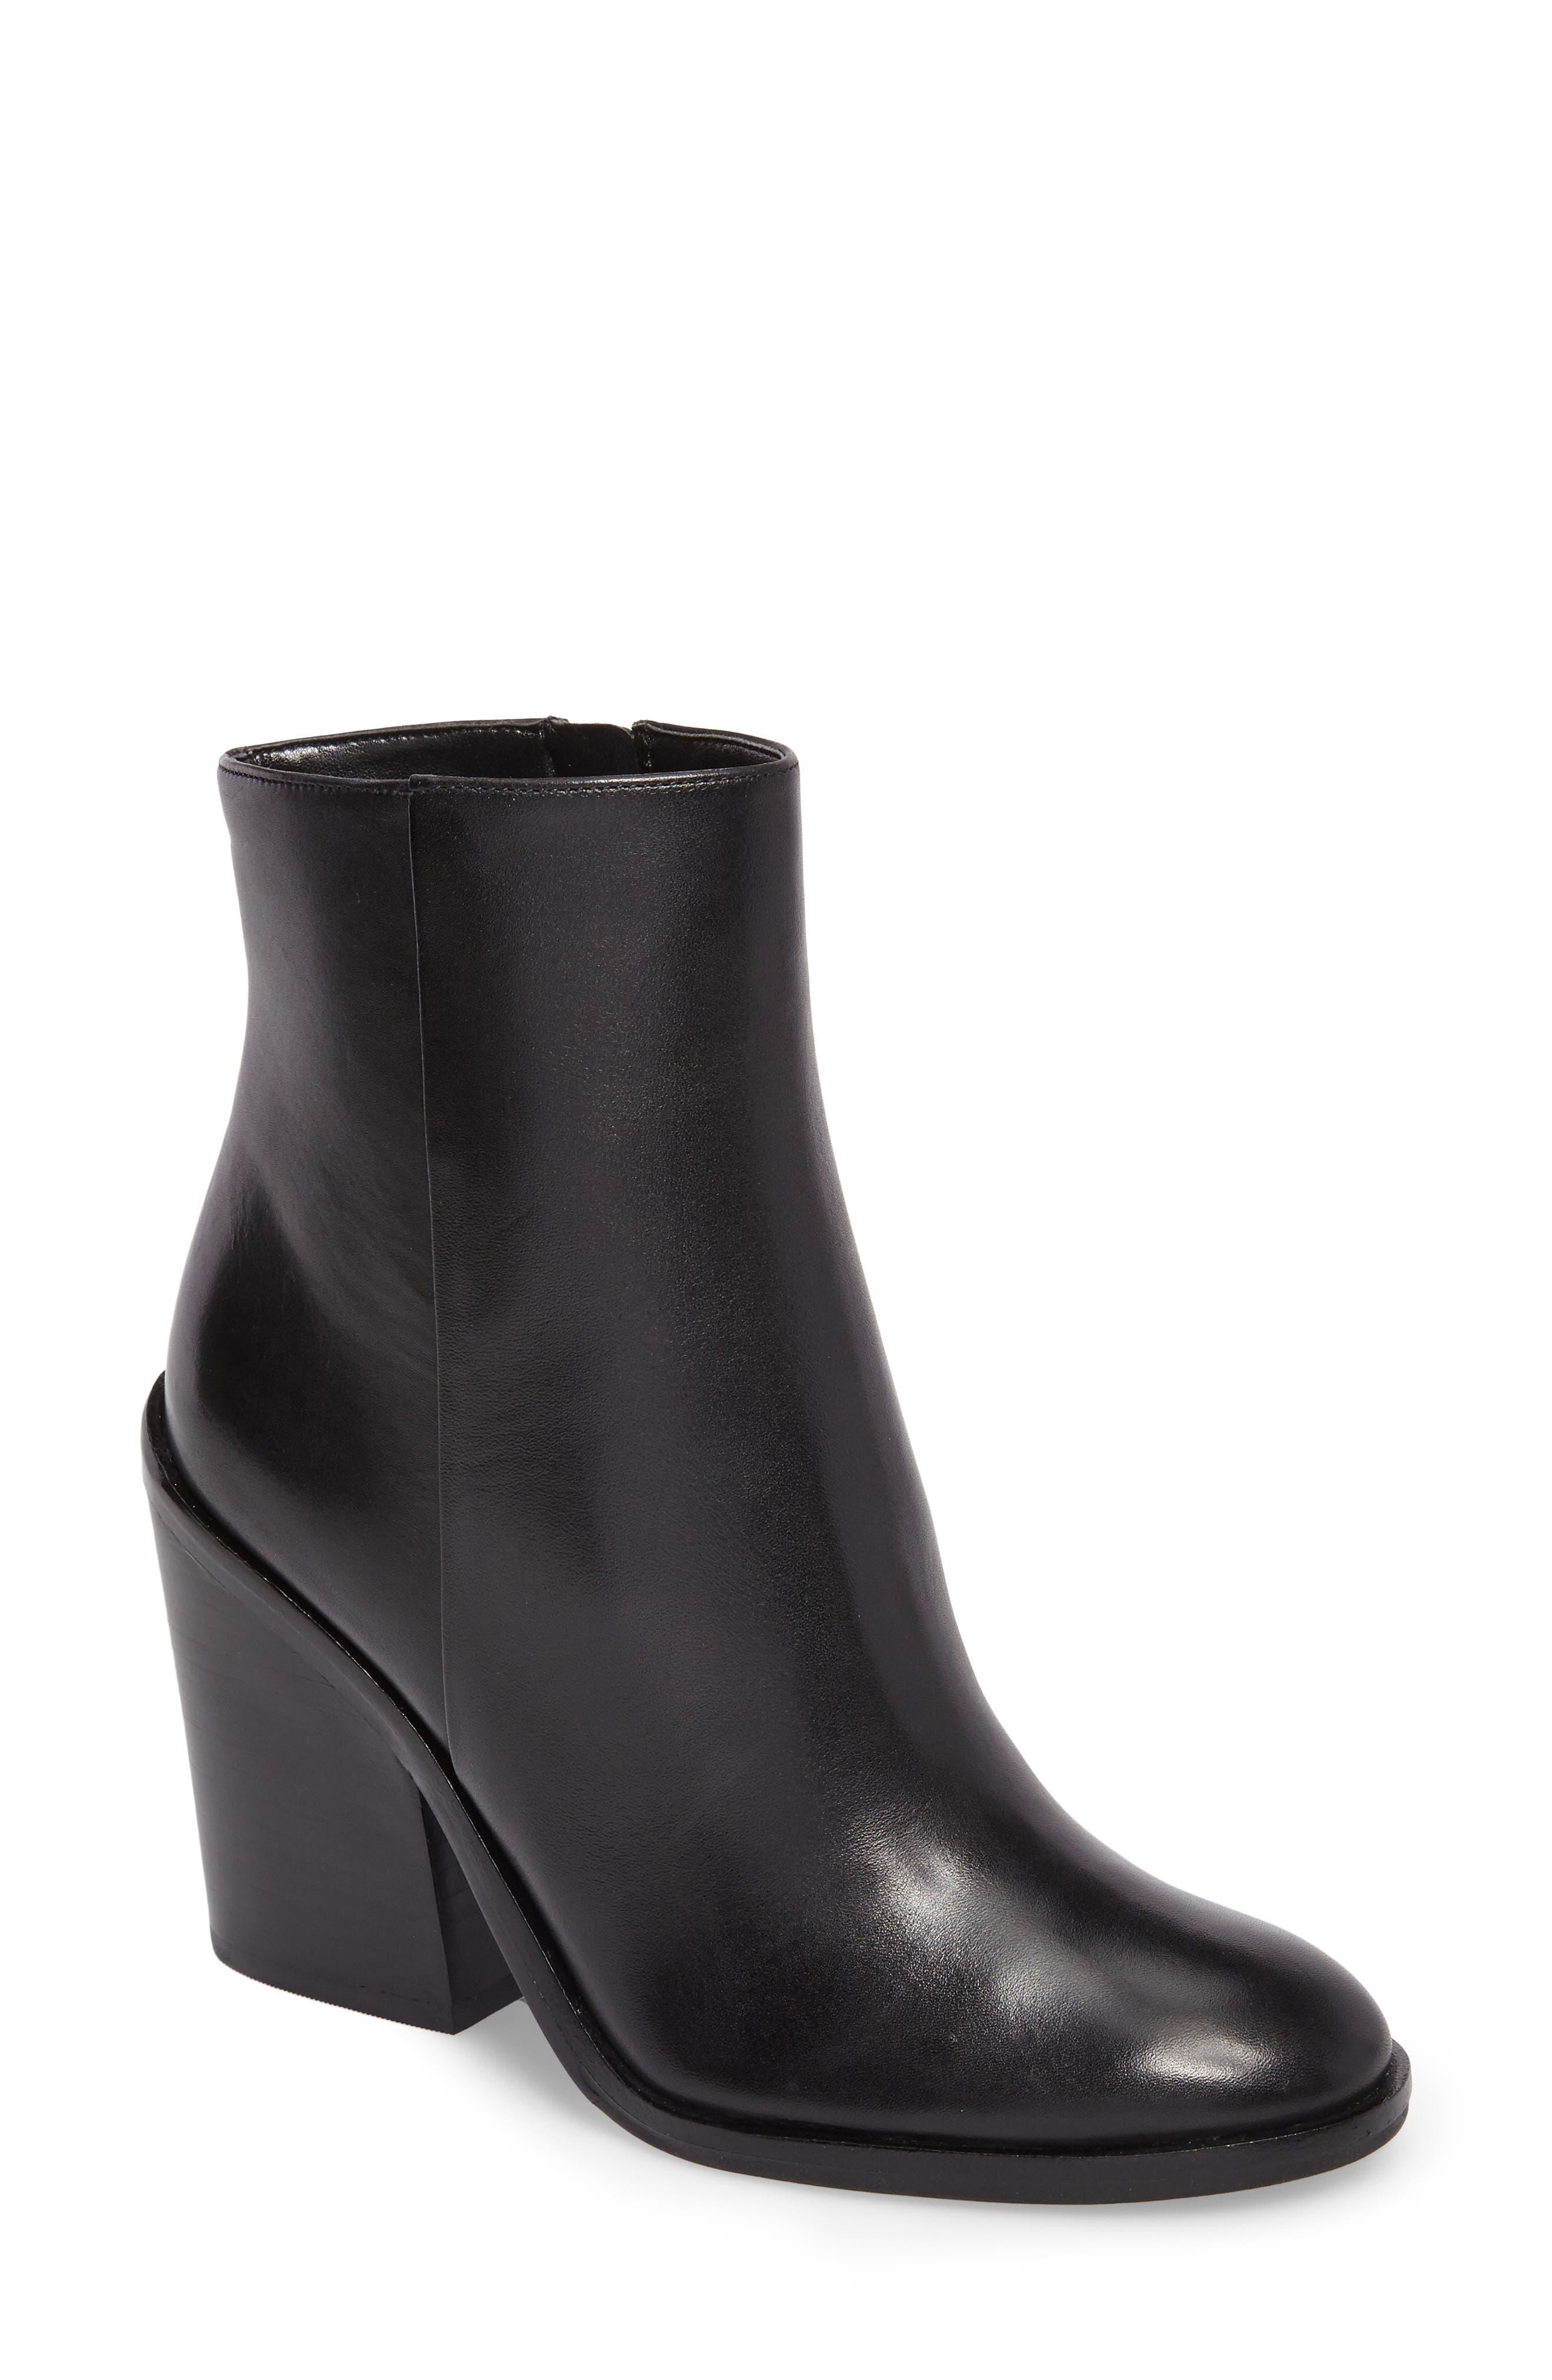 Mena Bootie,                             Main thumbnail 1, color,                             Black Leather